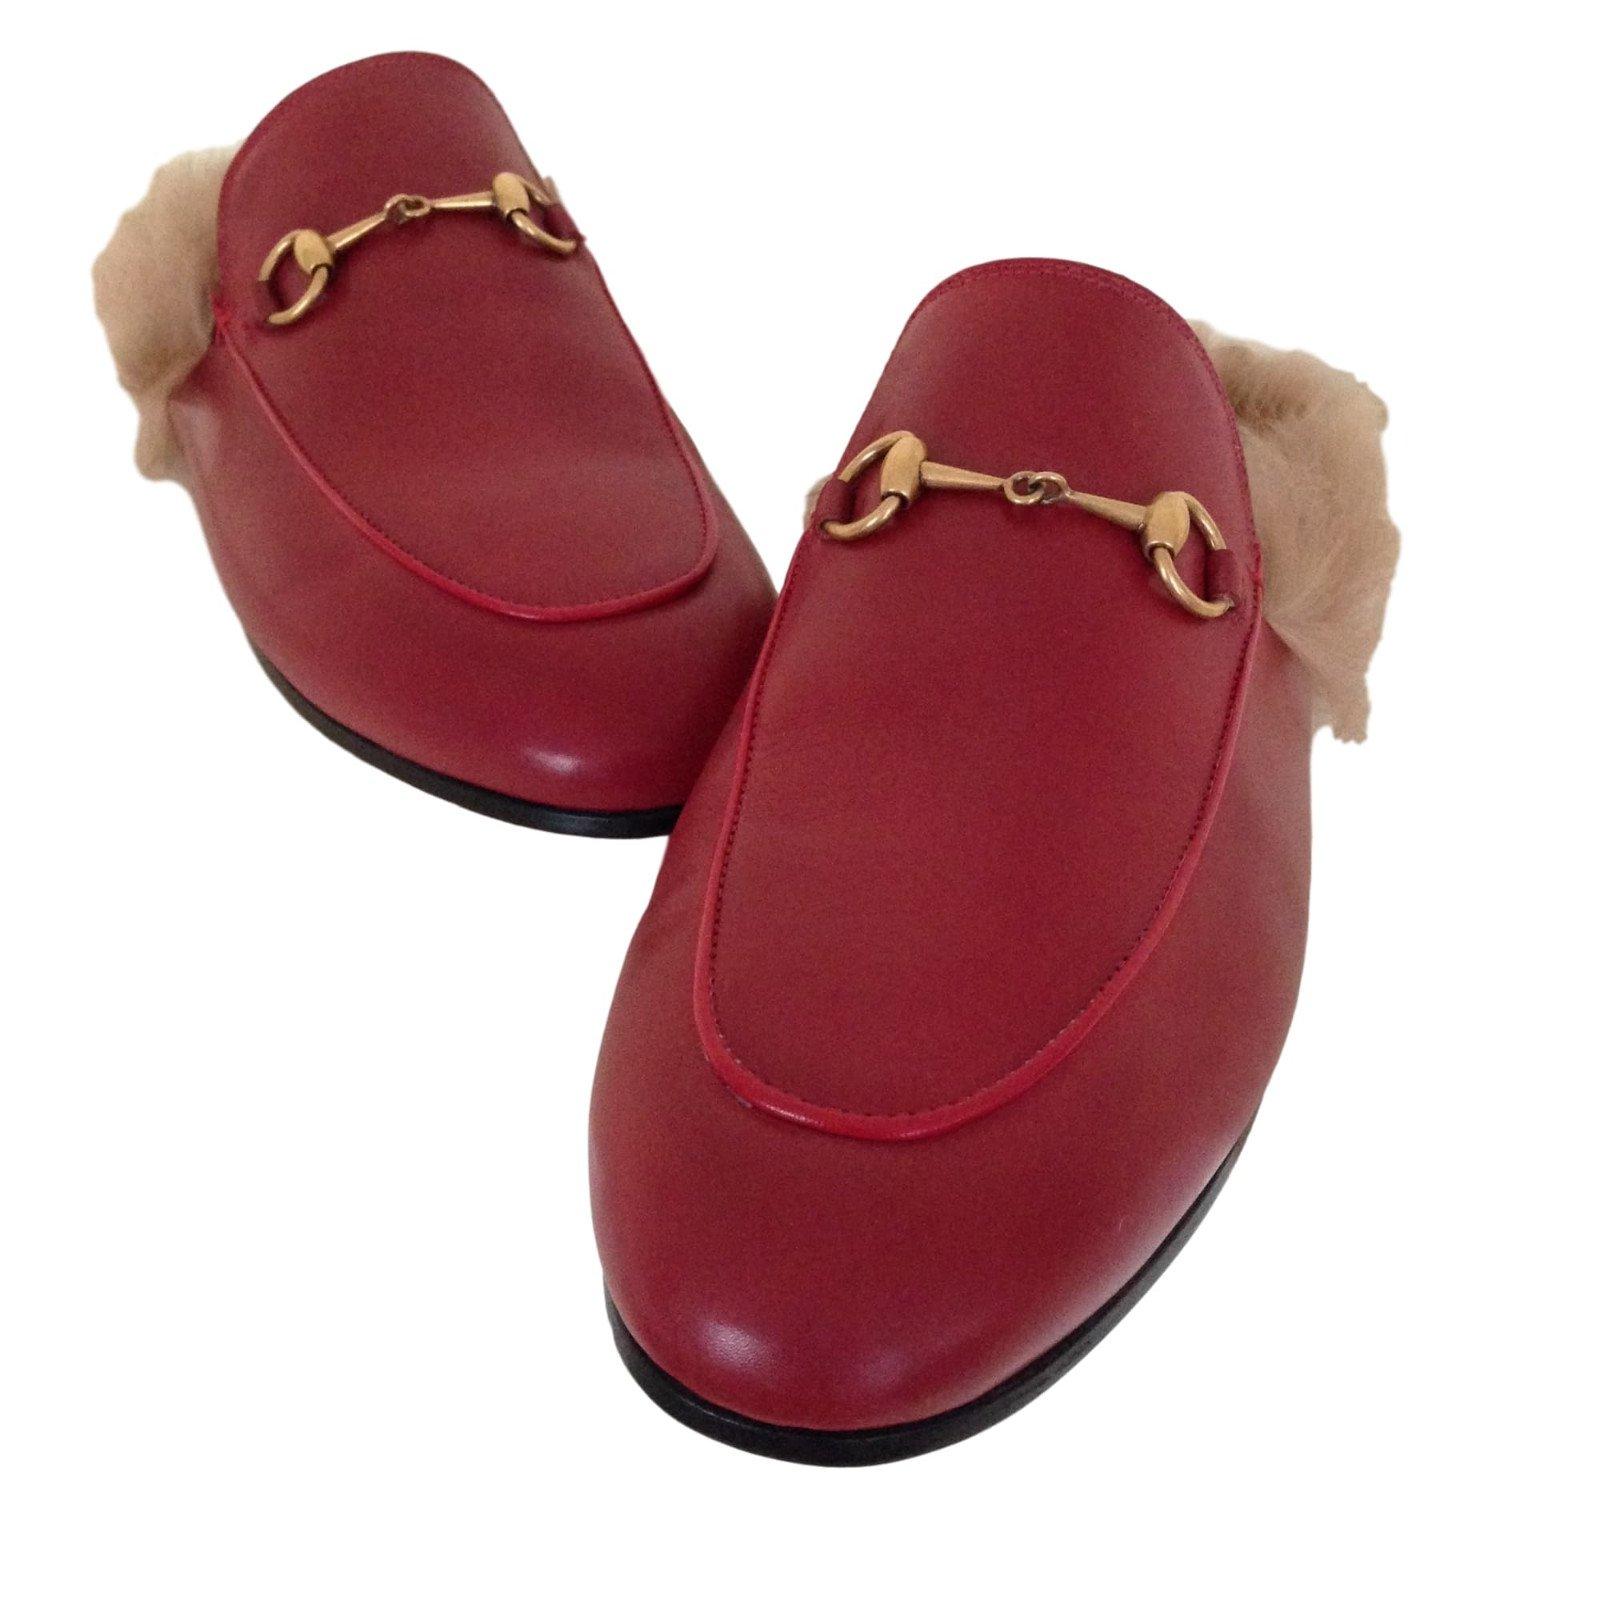 9de4f5295d39c3 Gucci Mules Flats Leather Dark red ref.45831 - Joli Closet